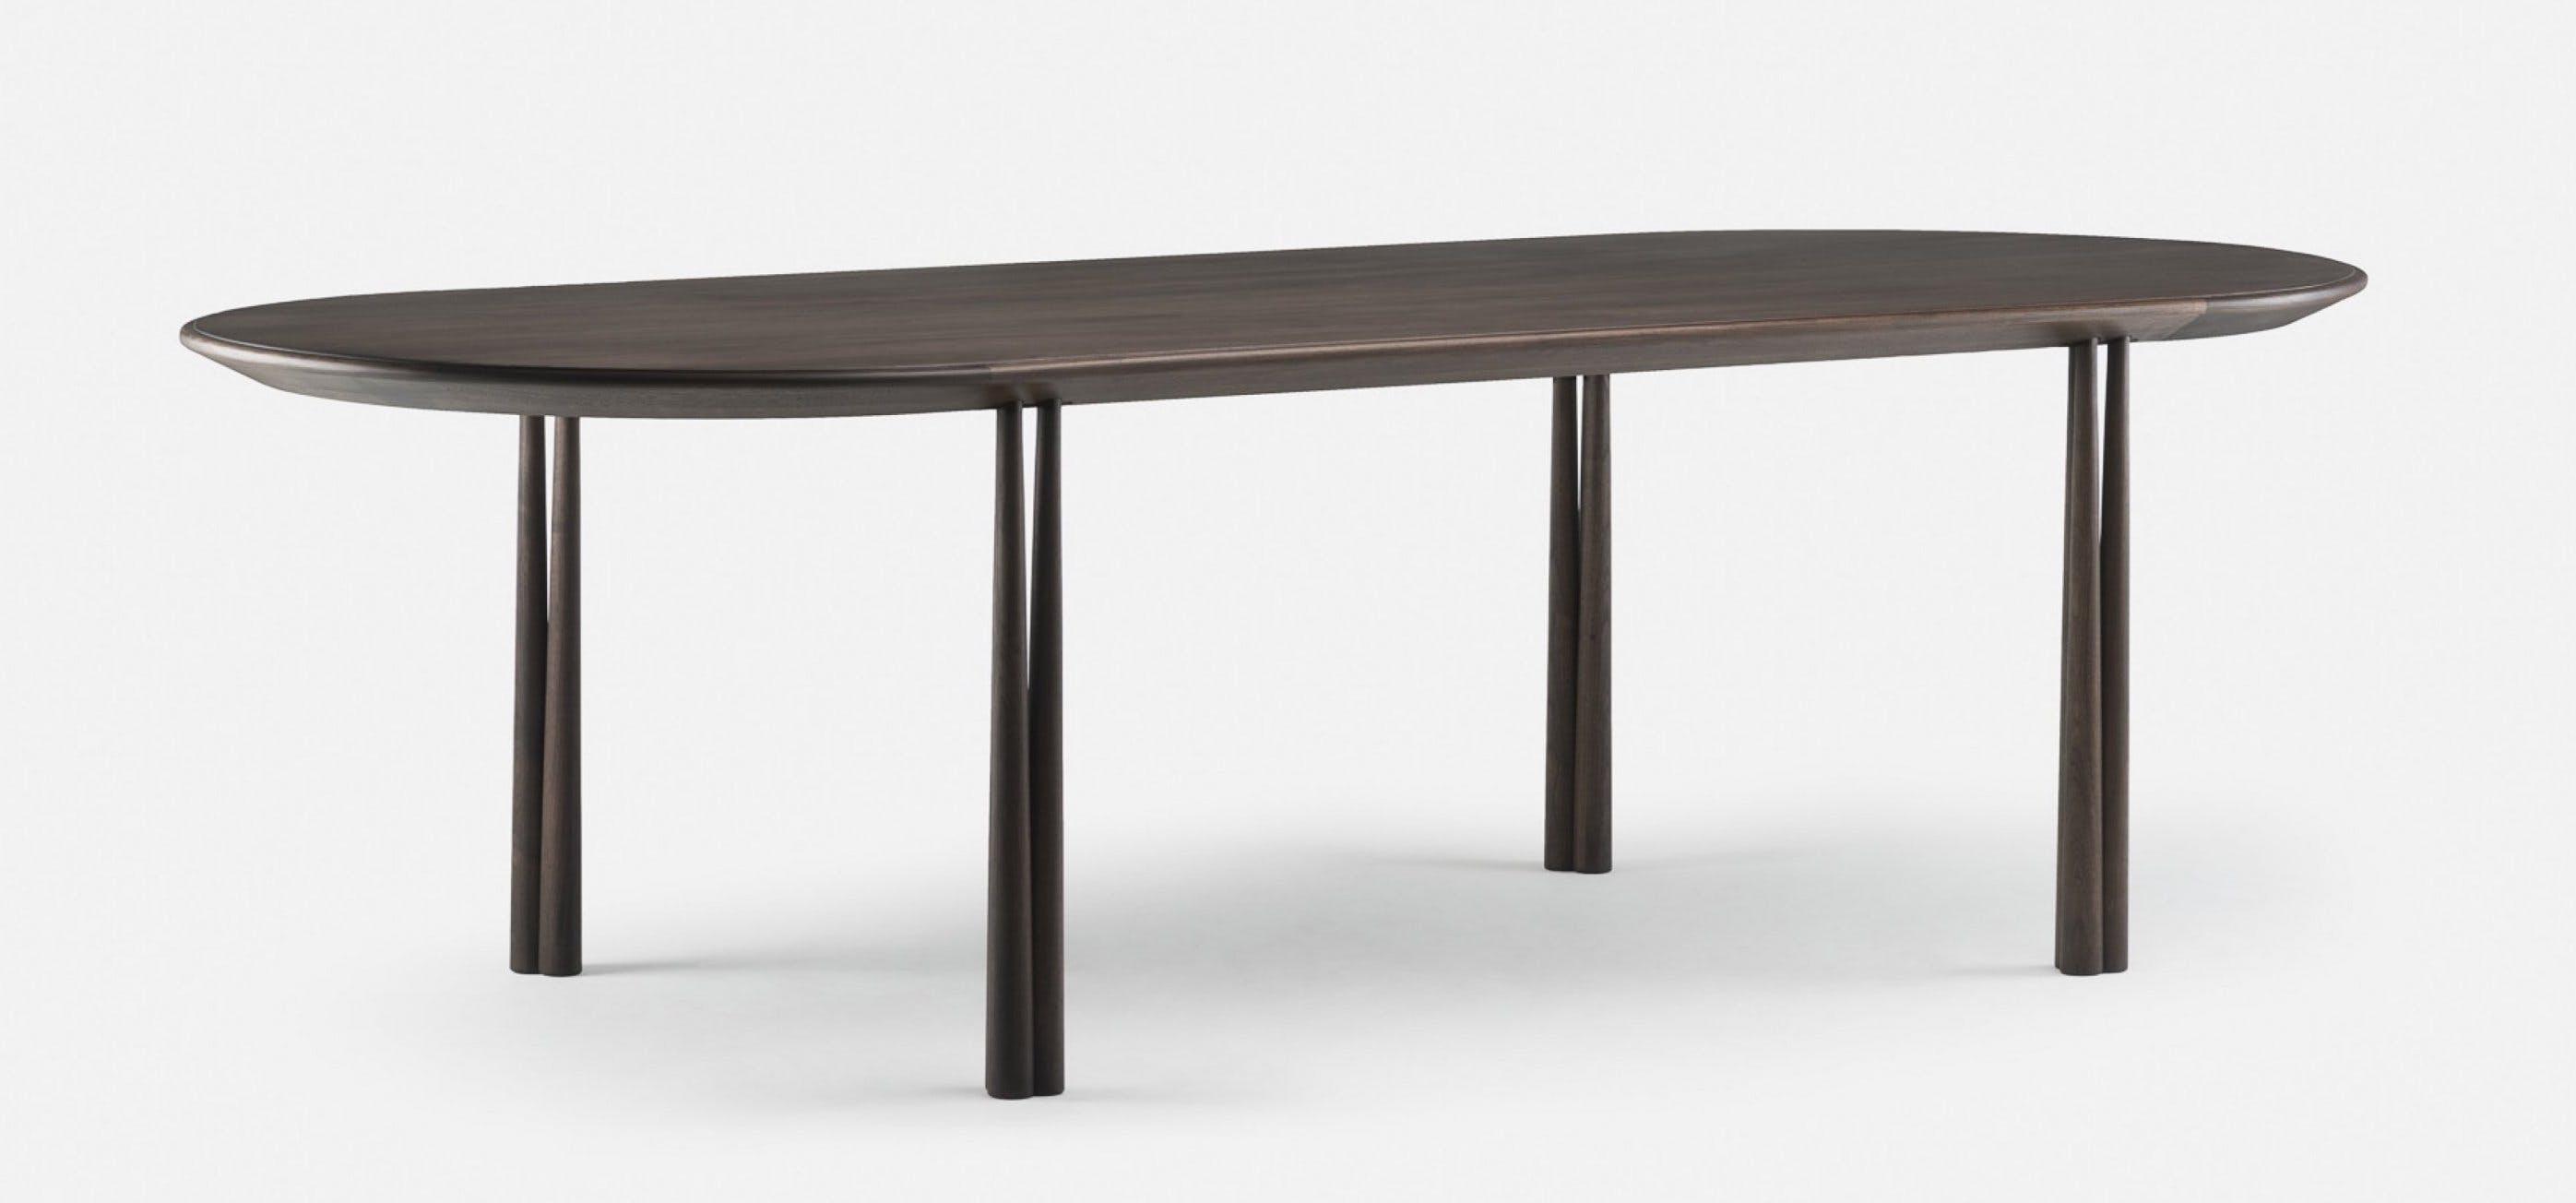 Eliot Table Web1 2800X1900